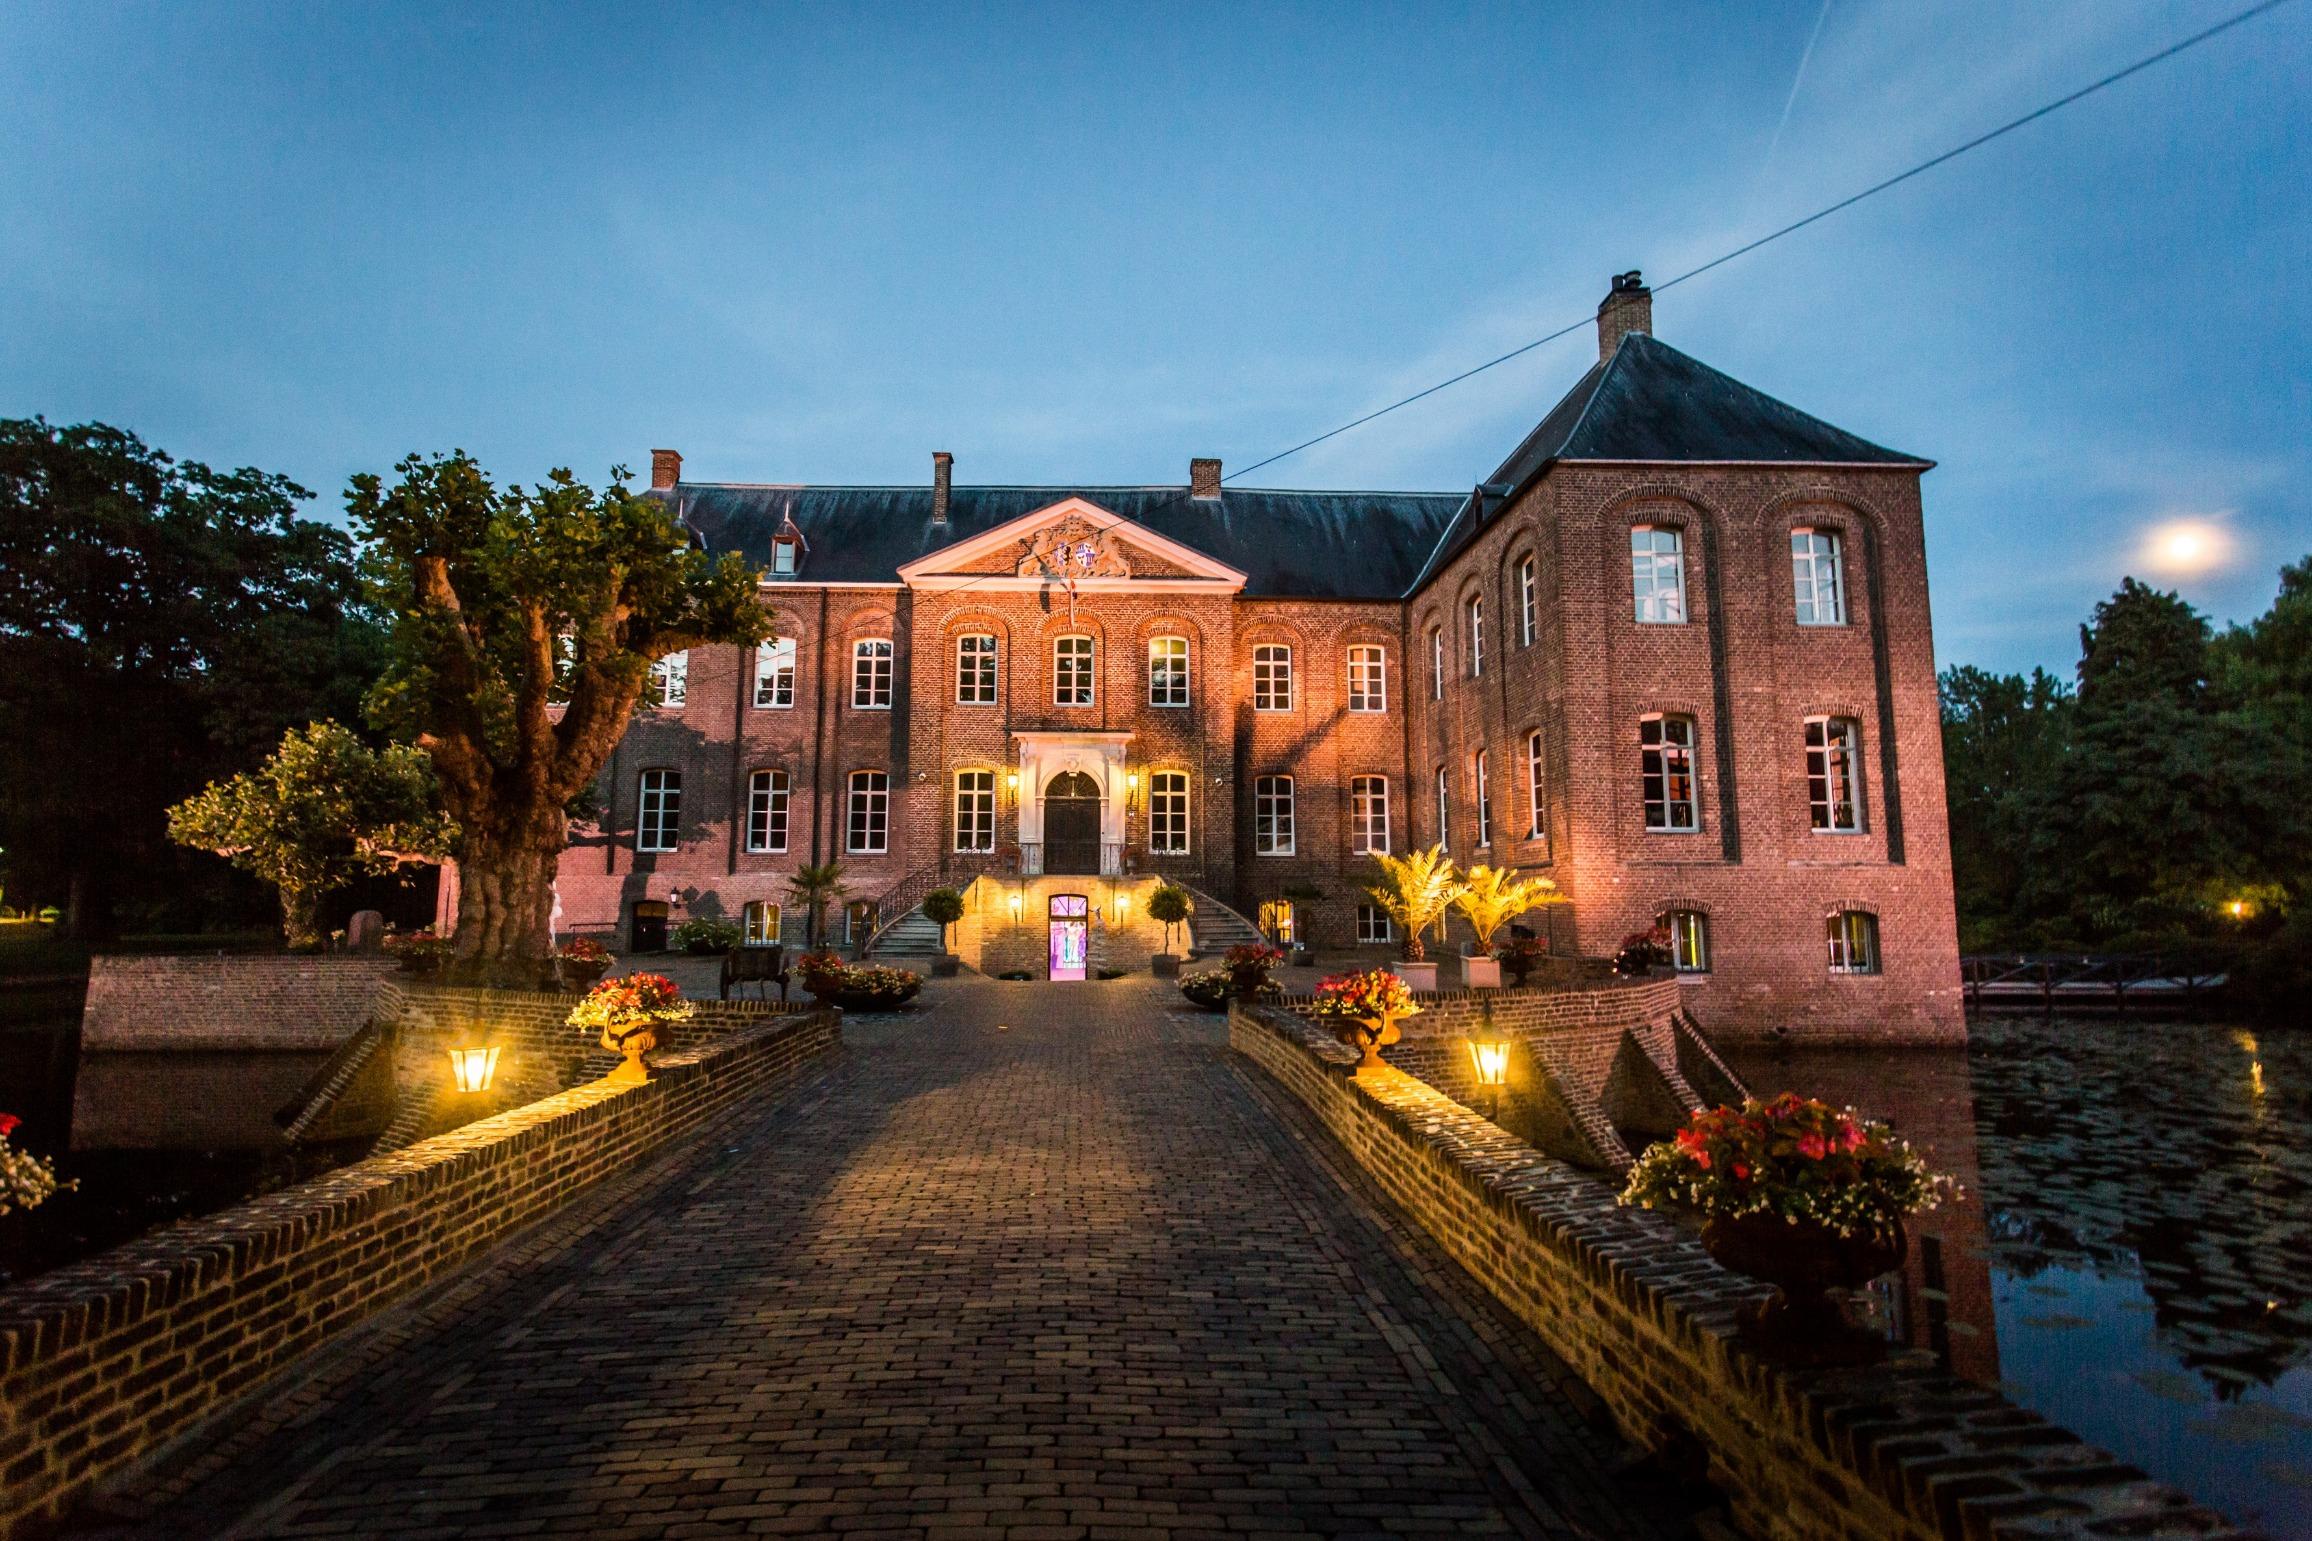 Schlossgärten annulieren Sommerabende wegen verschärfter Corona-Maßnahmen